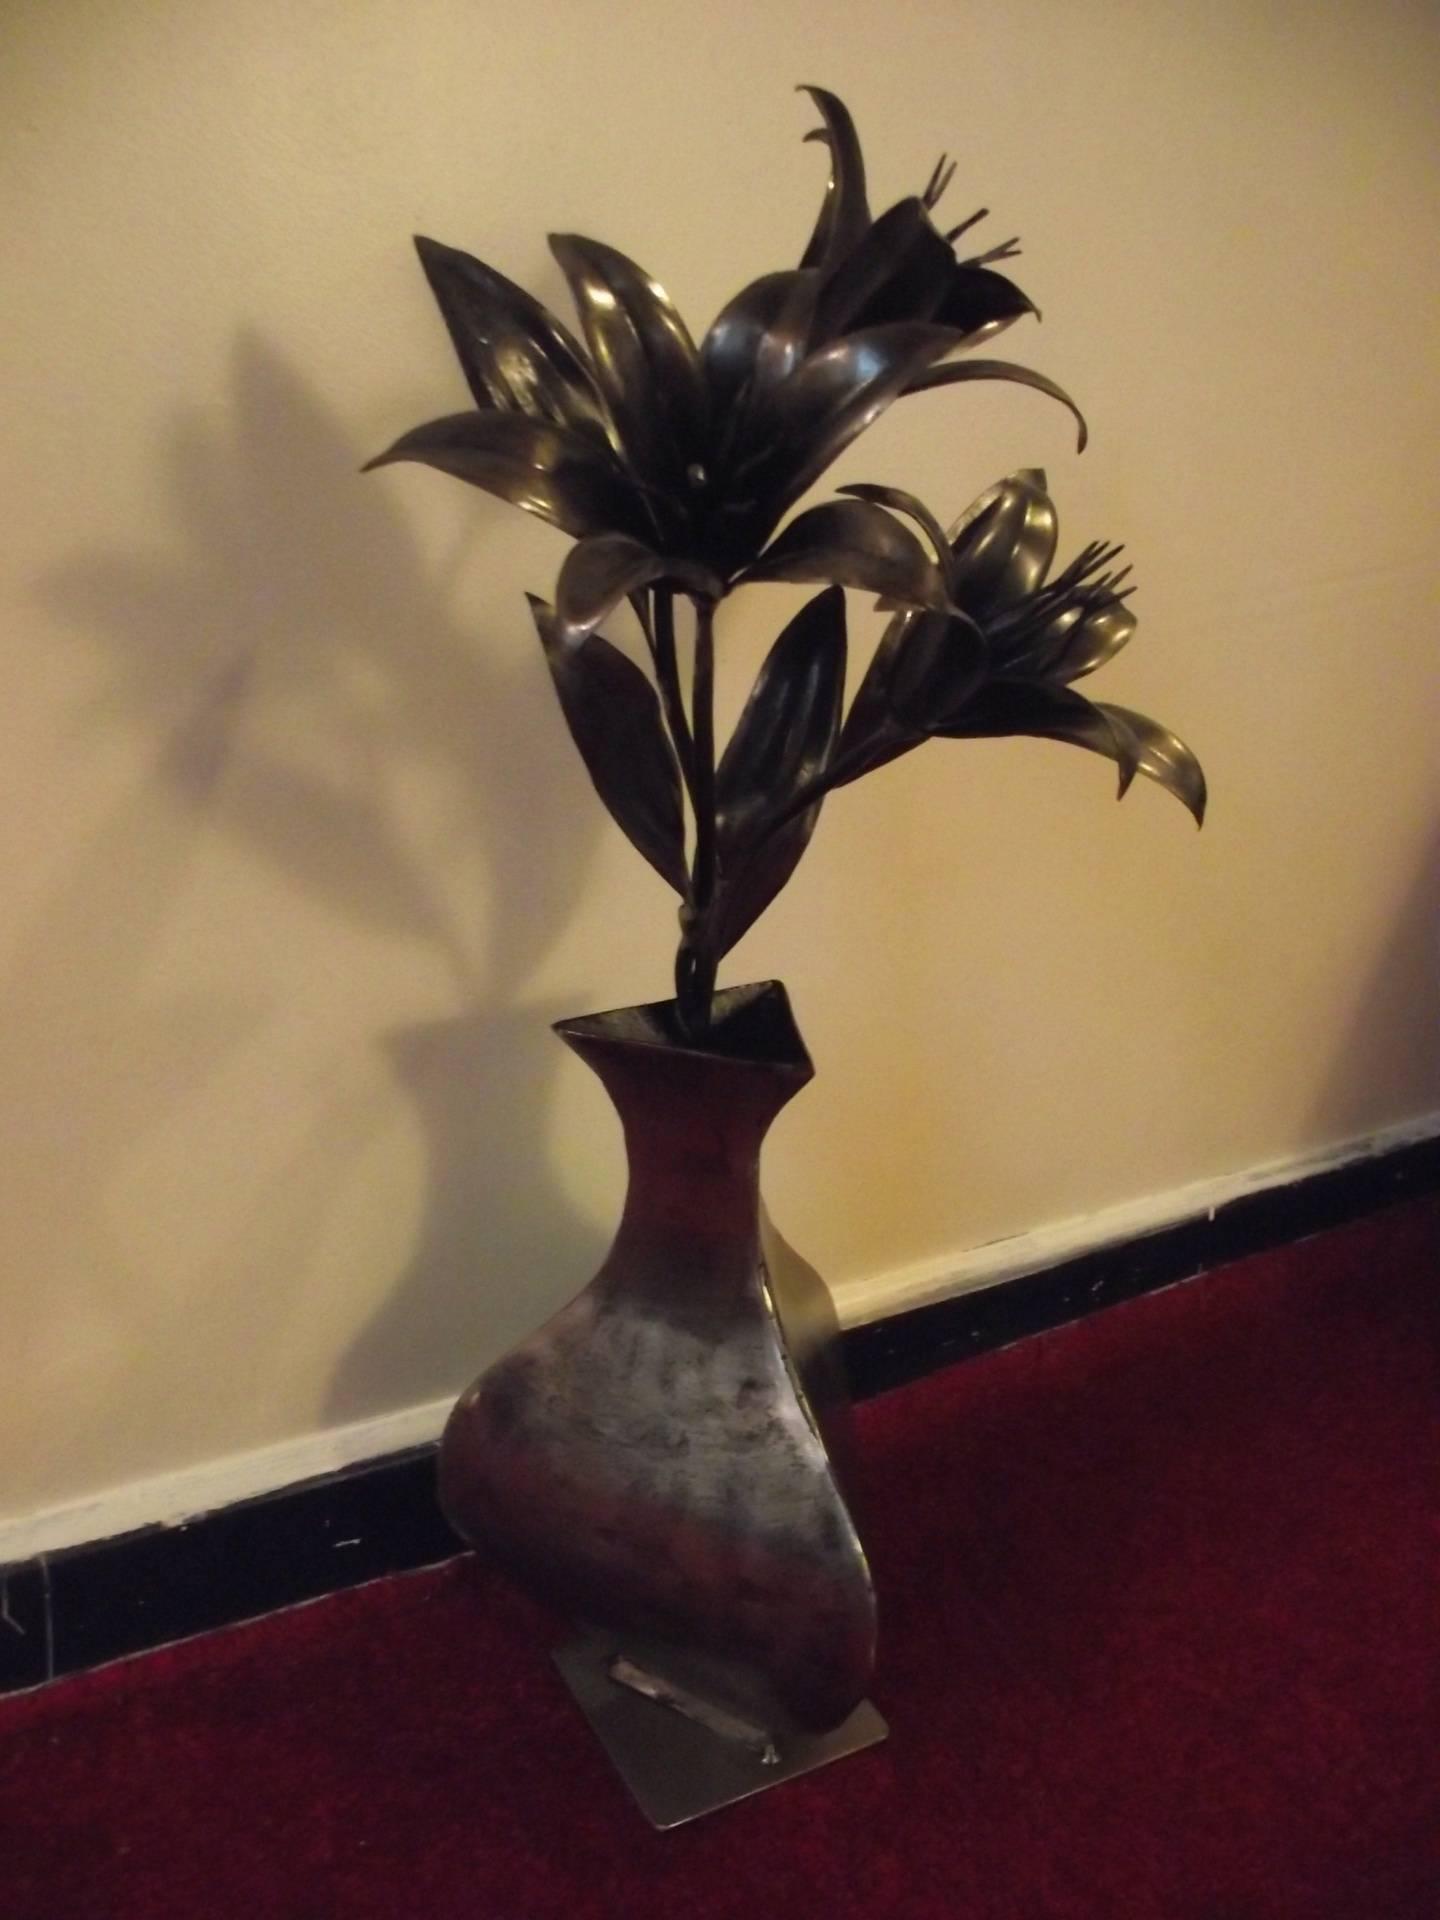 Lilies in Vase